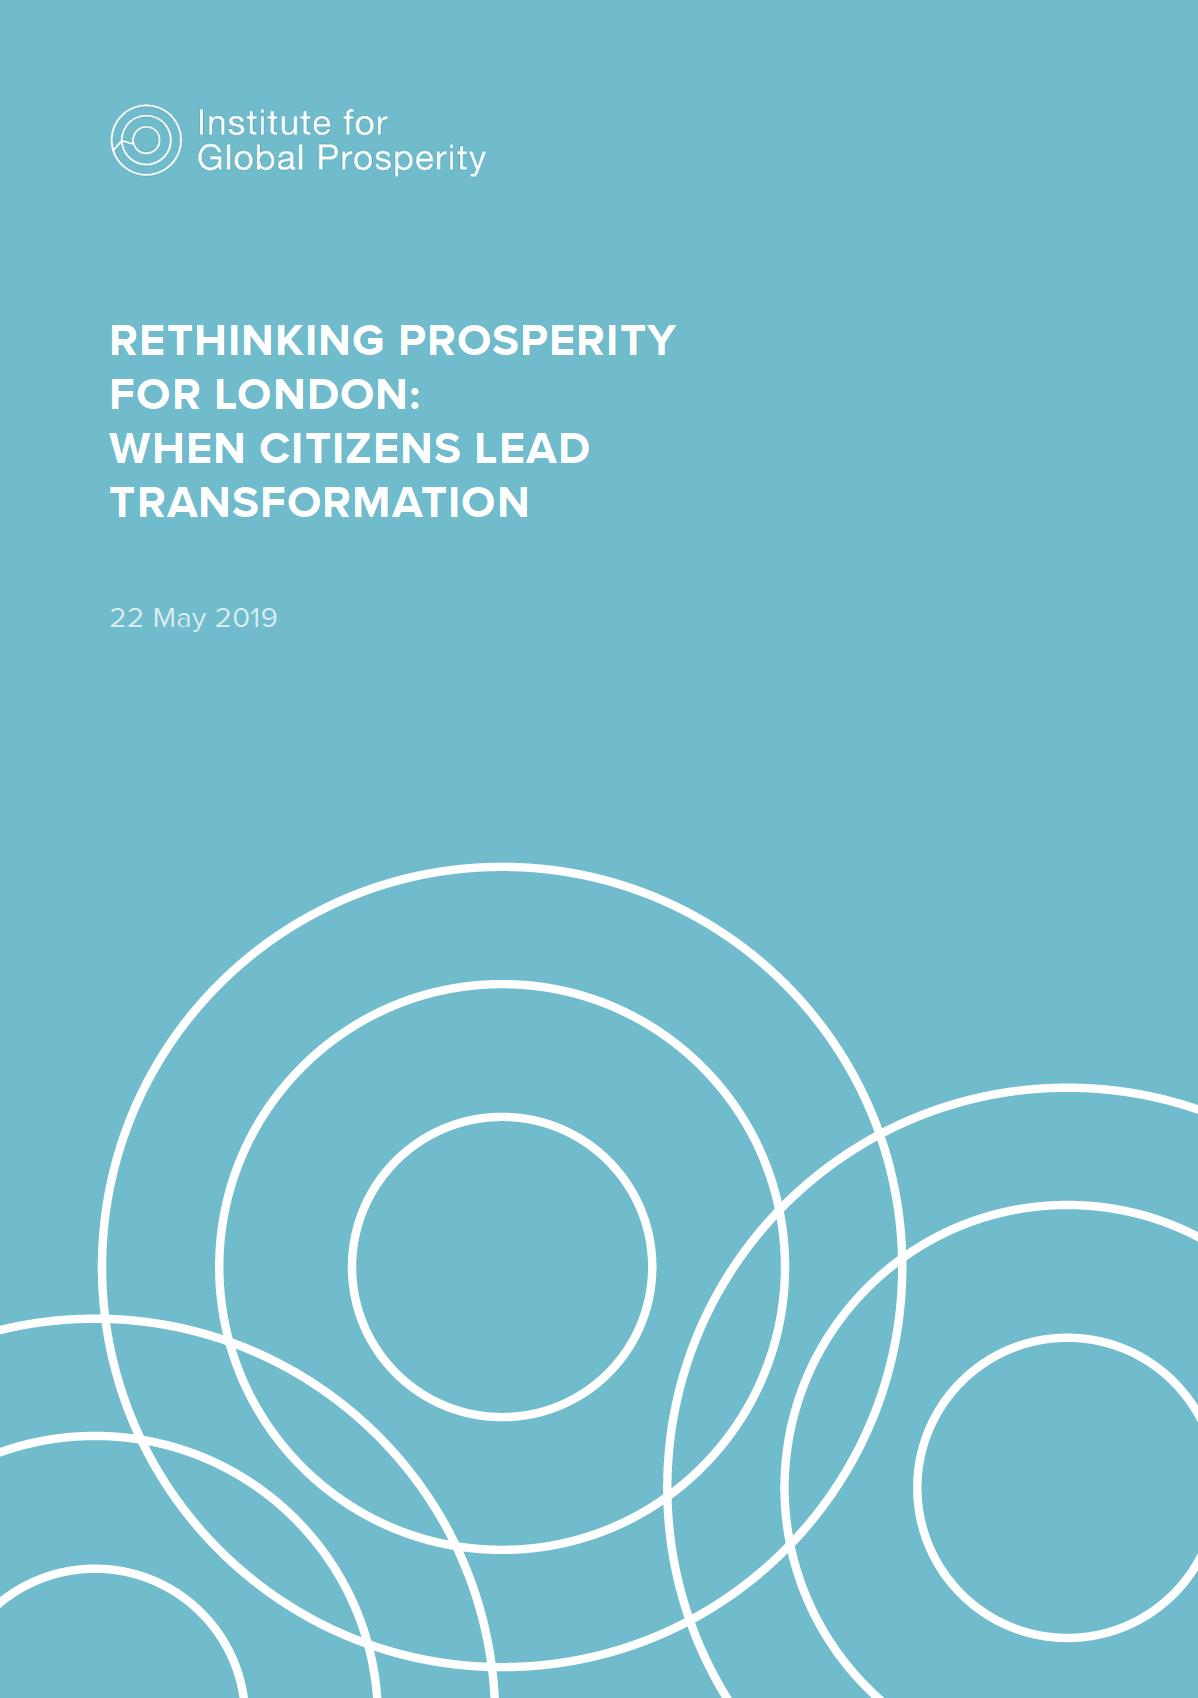 Rethinking Prosperity for London